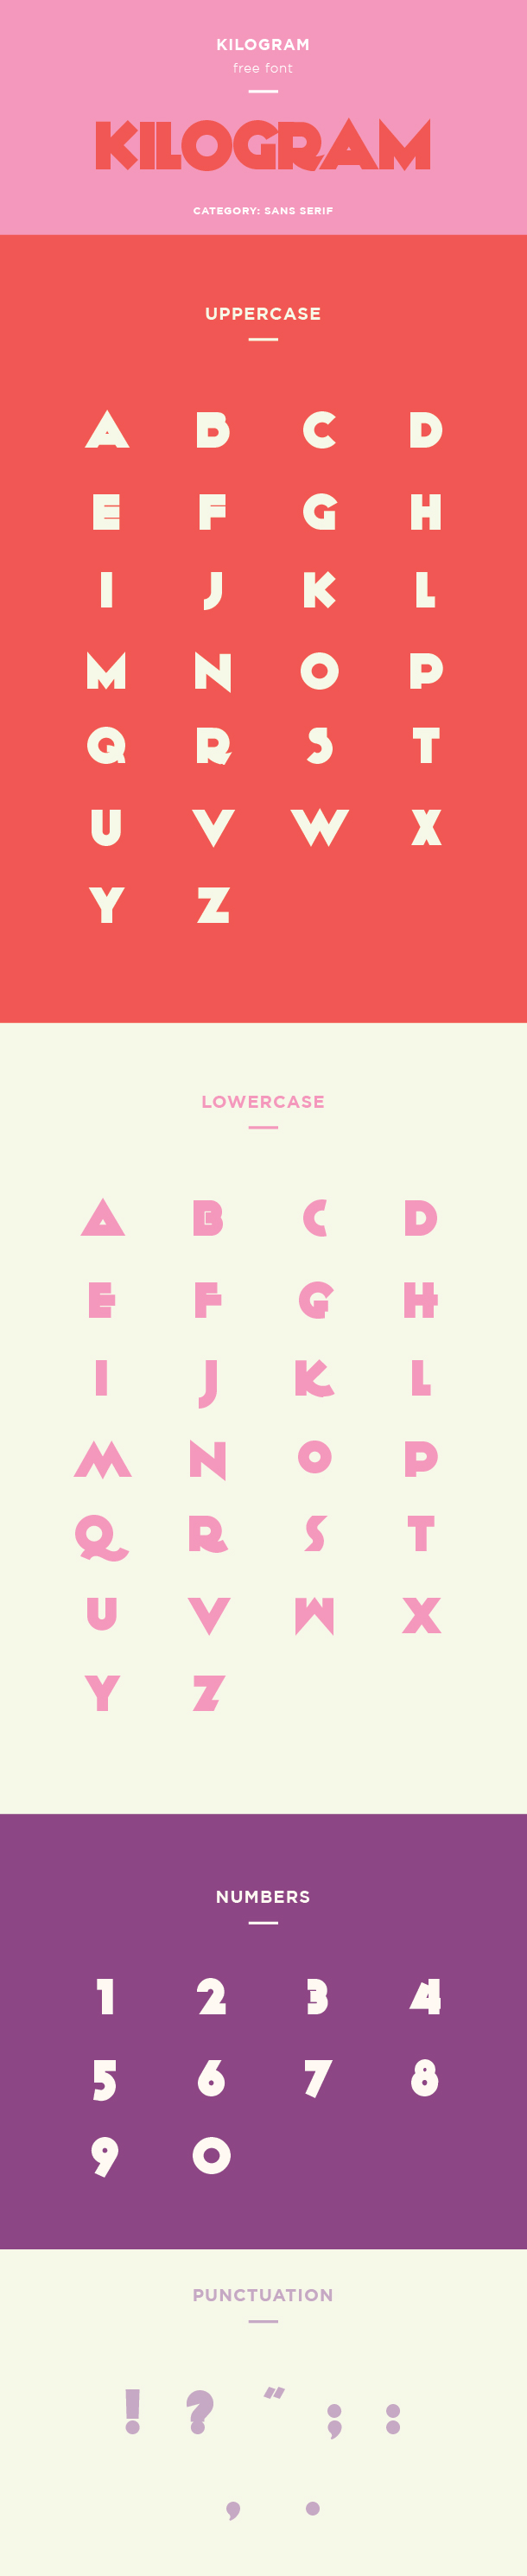 kilogram font example